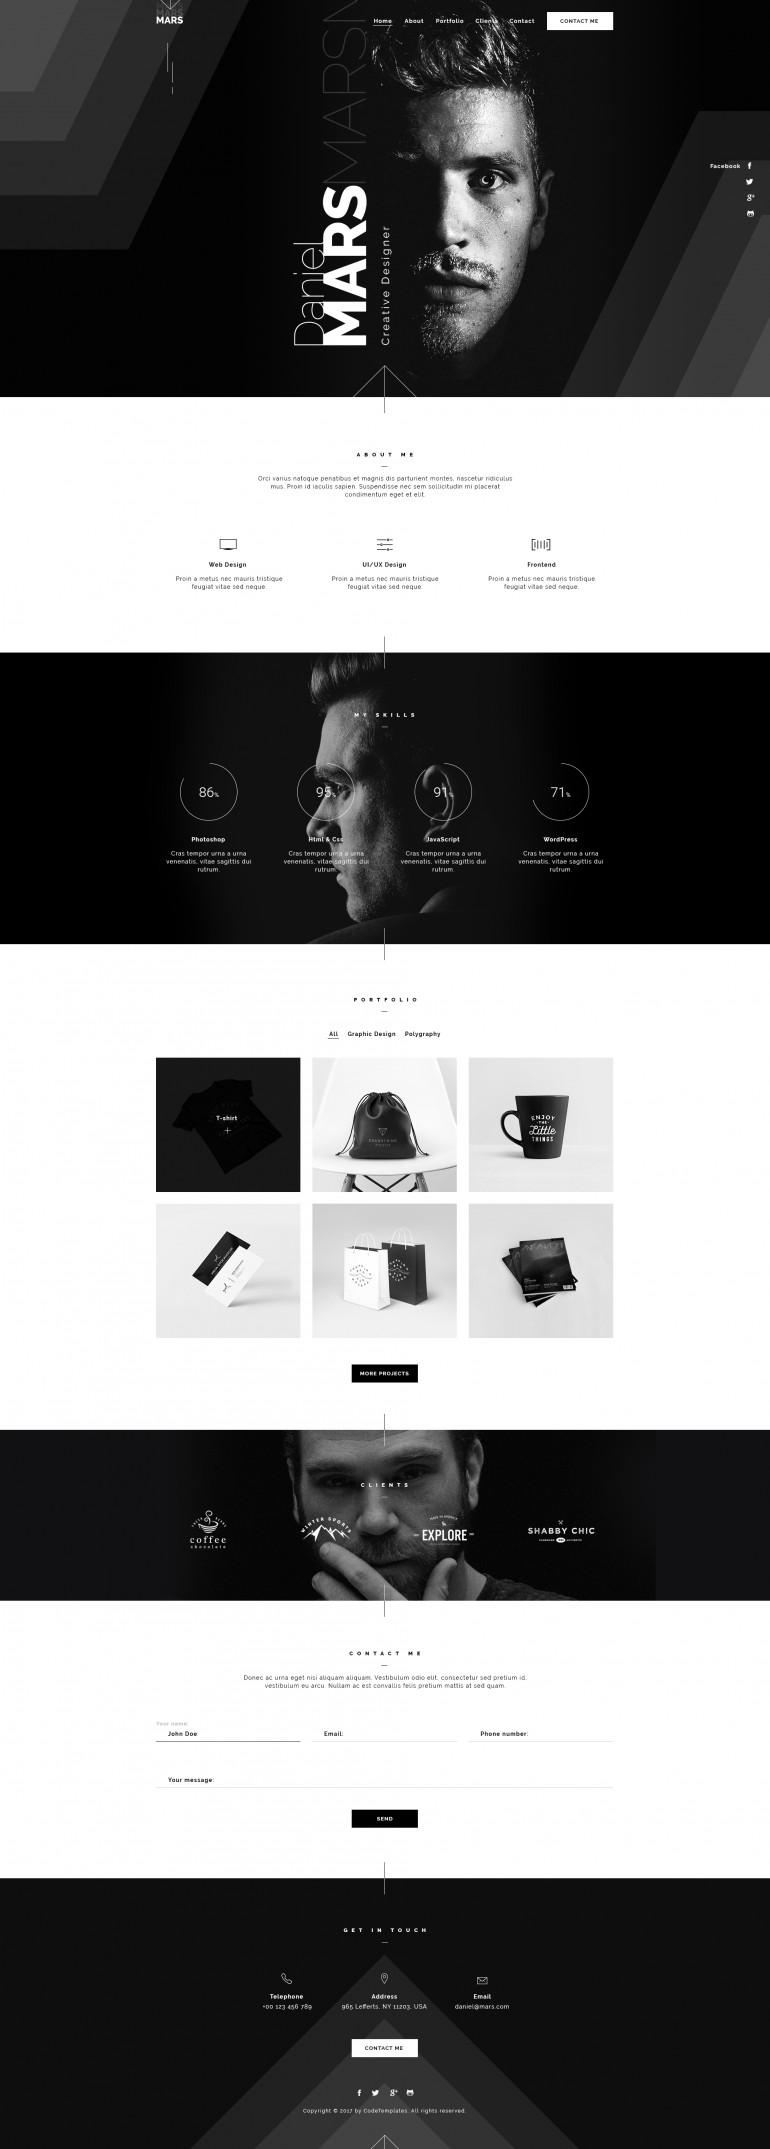 Mars – Personal Portfolio on Inspirationde